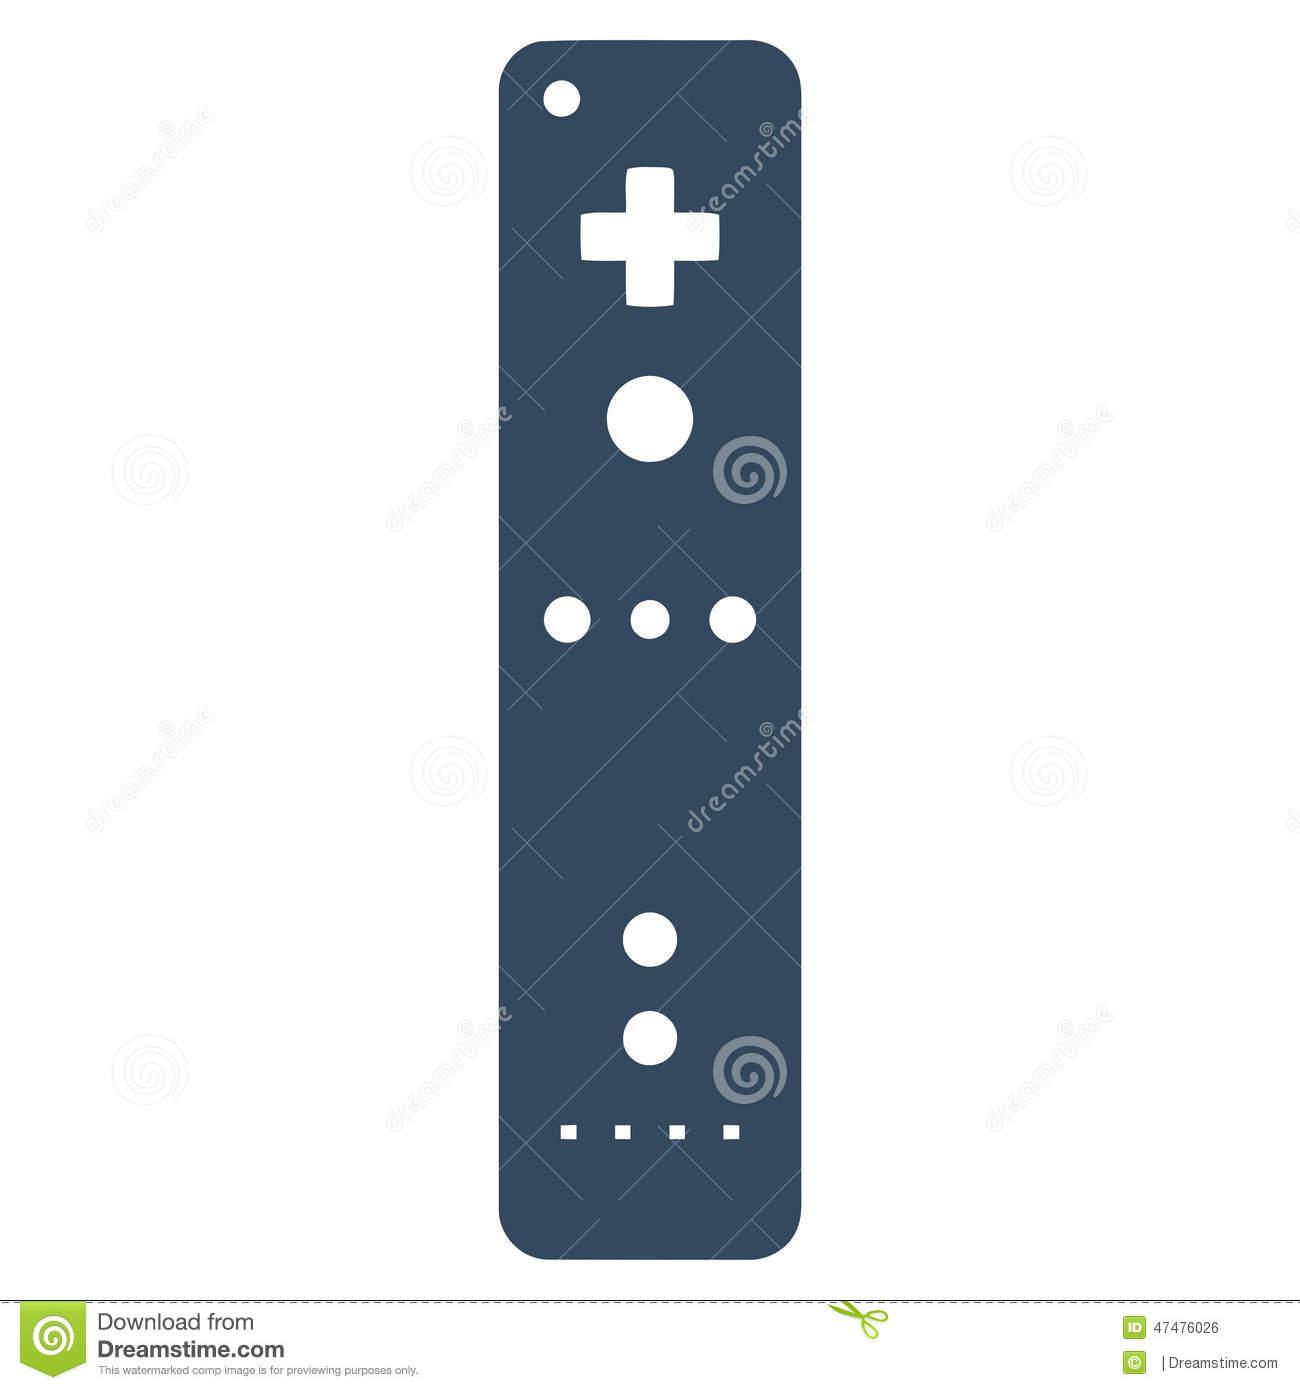 Wii Stock Illustrations.